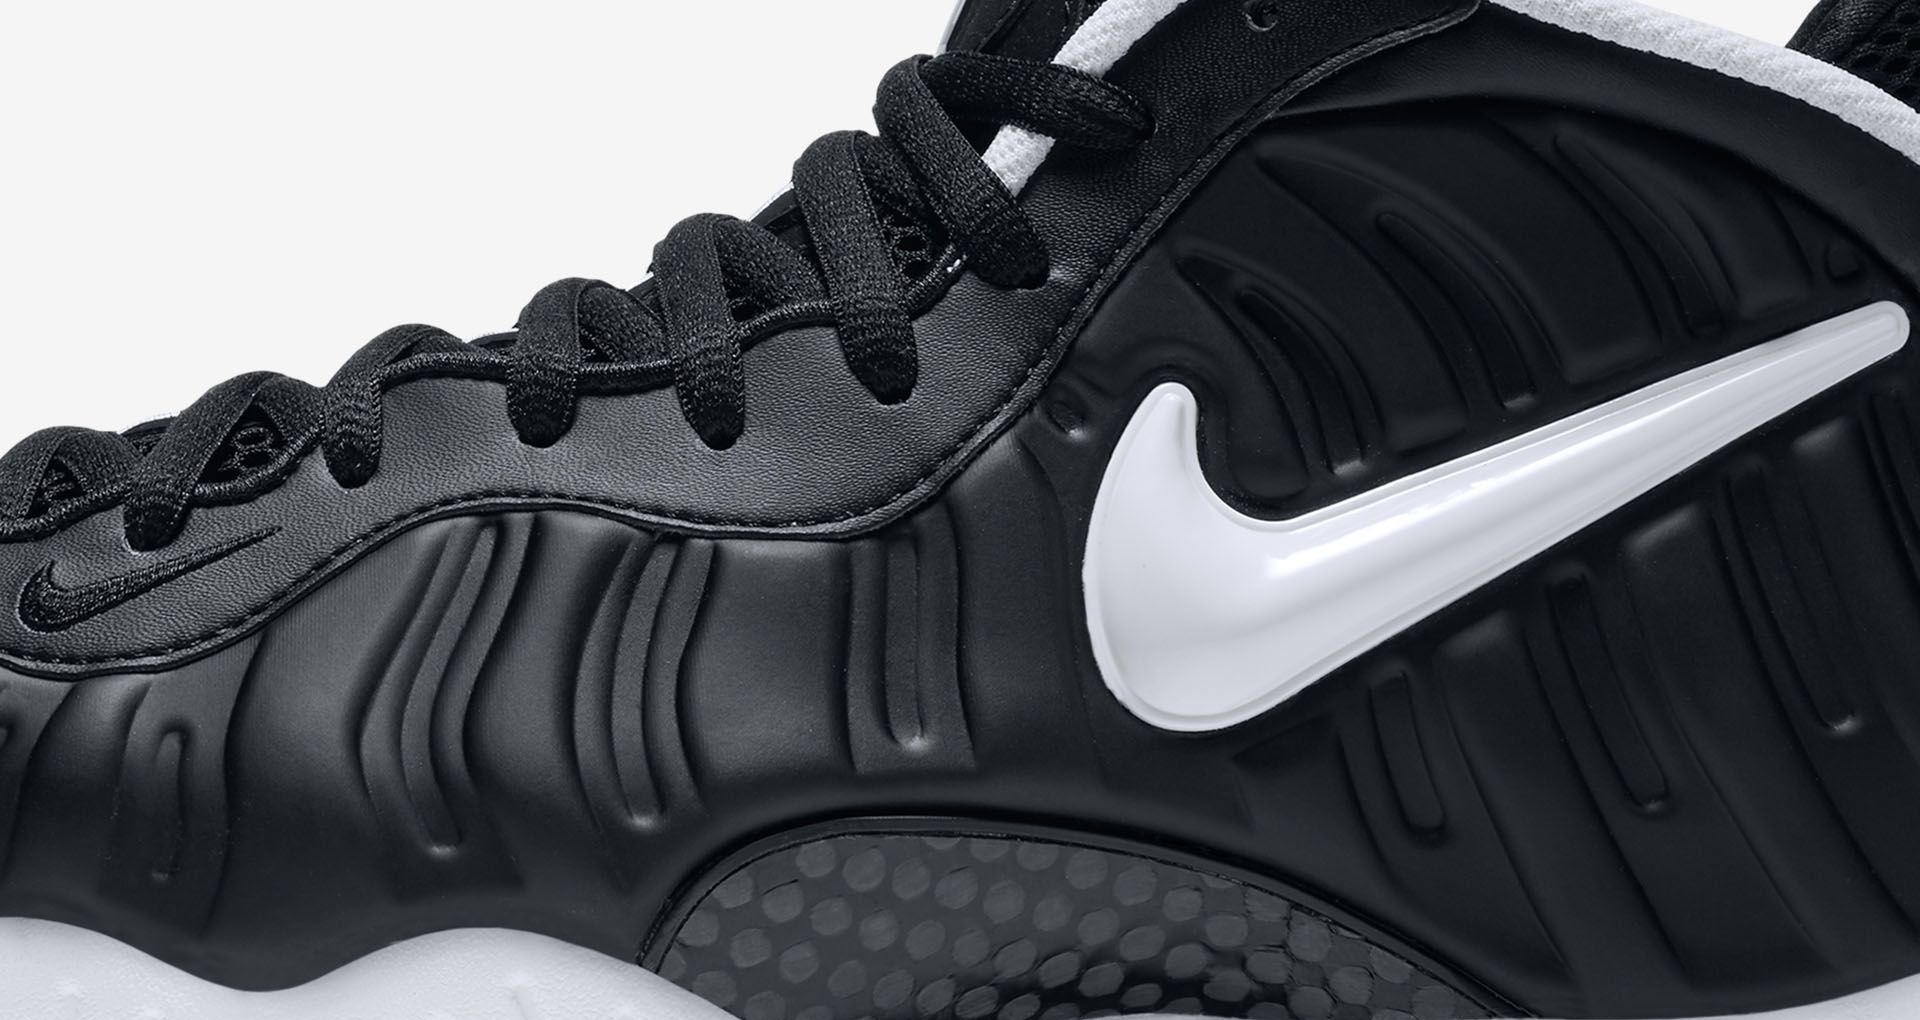 42d423b875b Nike Air Foamposite Pro  Black   White  2016. Nike+ SNKRS